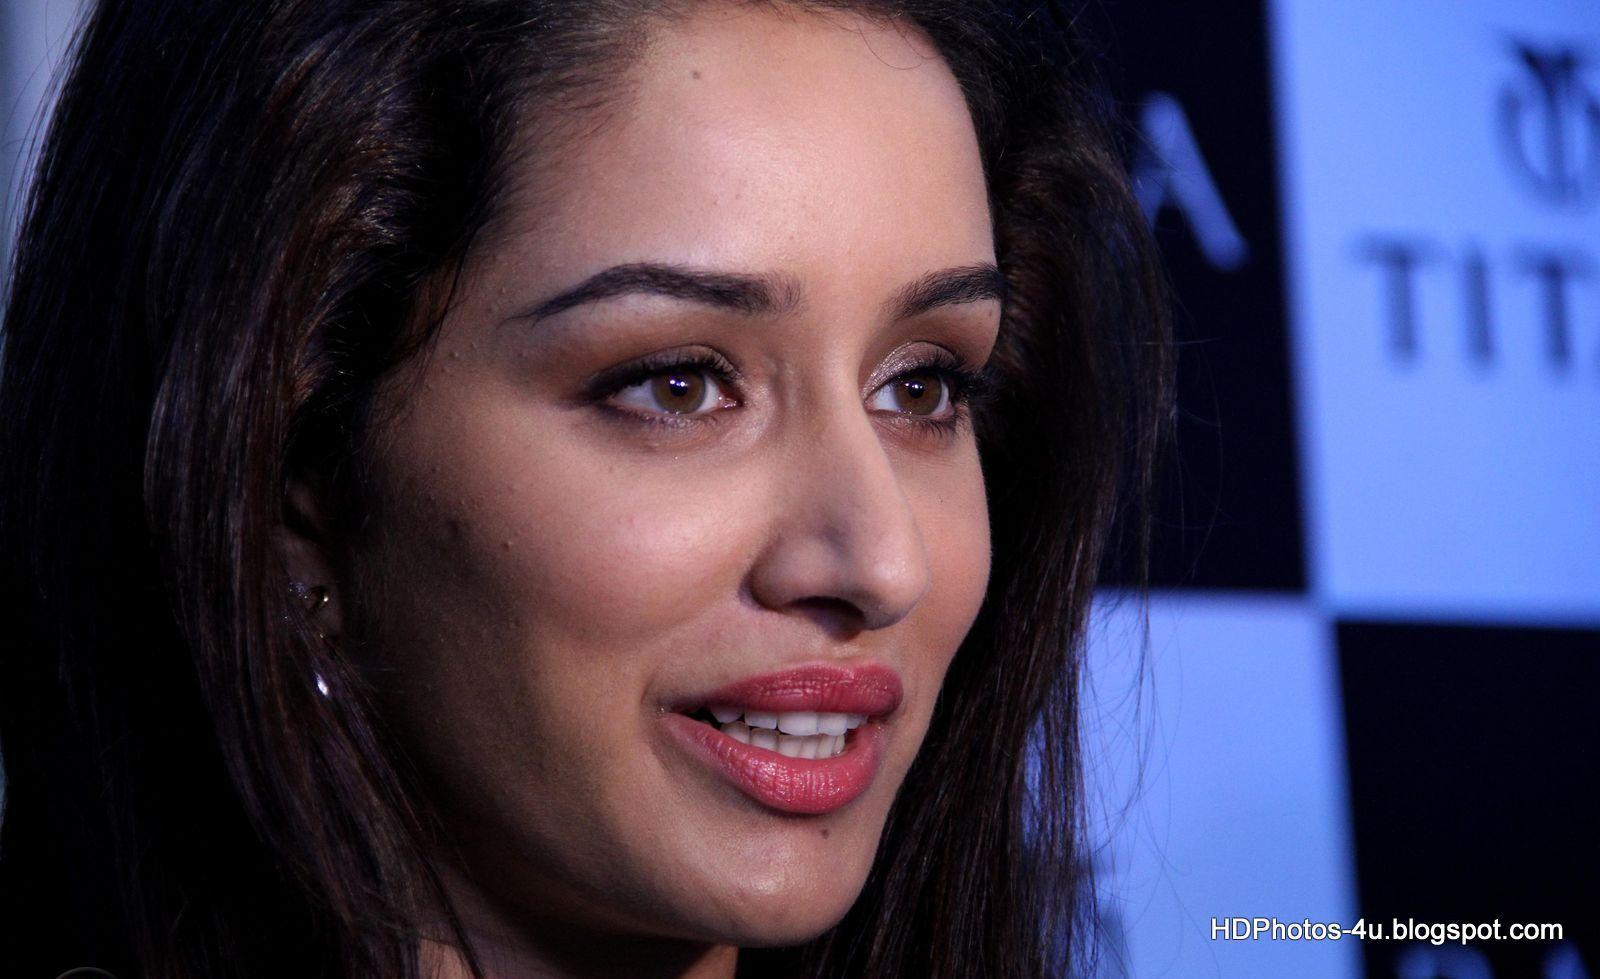 actress%2c+actress+hd+wallpapers%2c+bollywood%2c+entertainment%2c+hd